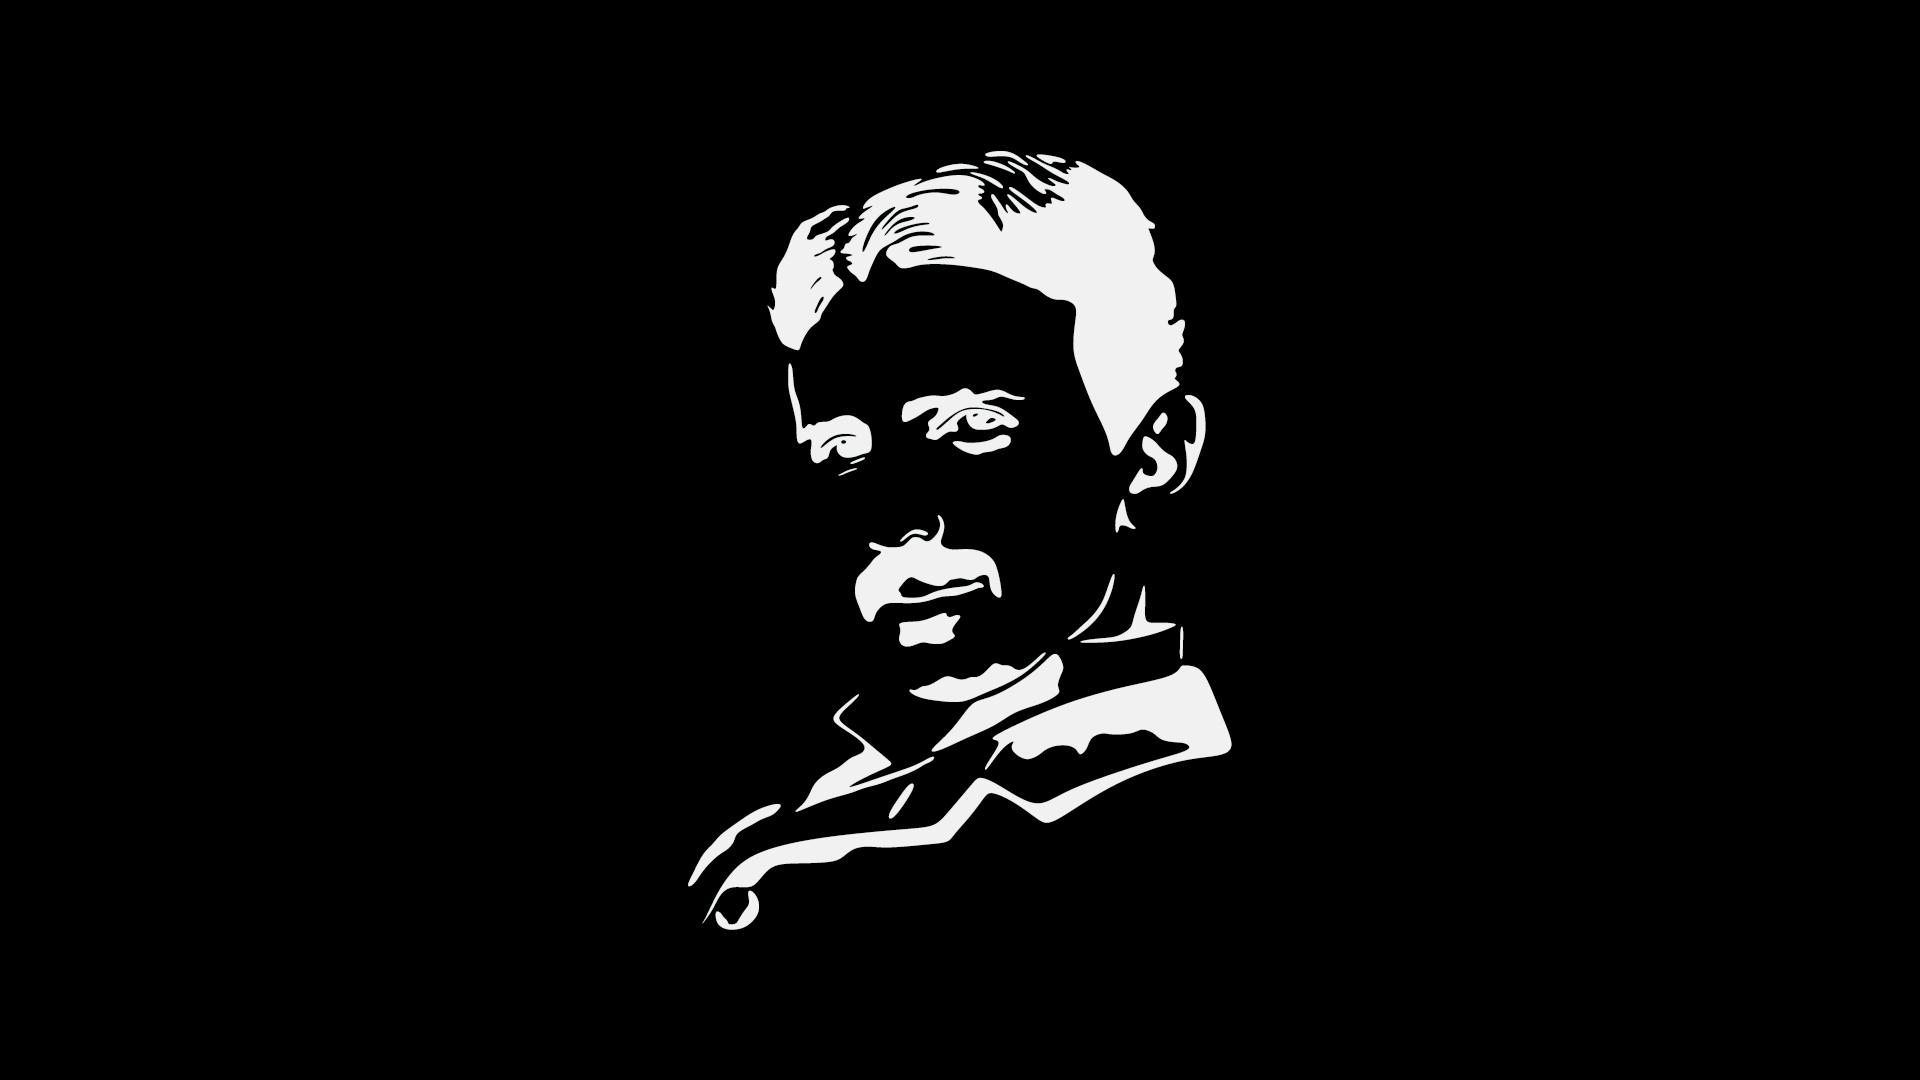 Nikola Tesla Wallpapers Wallpapersafari